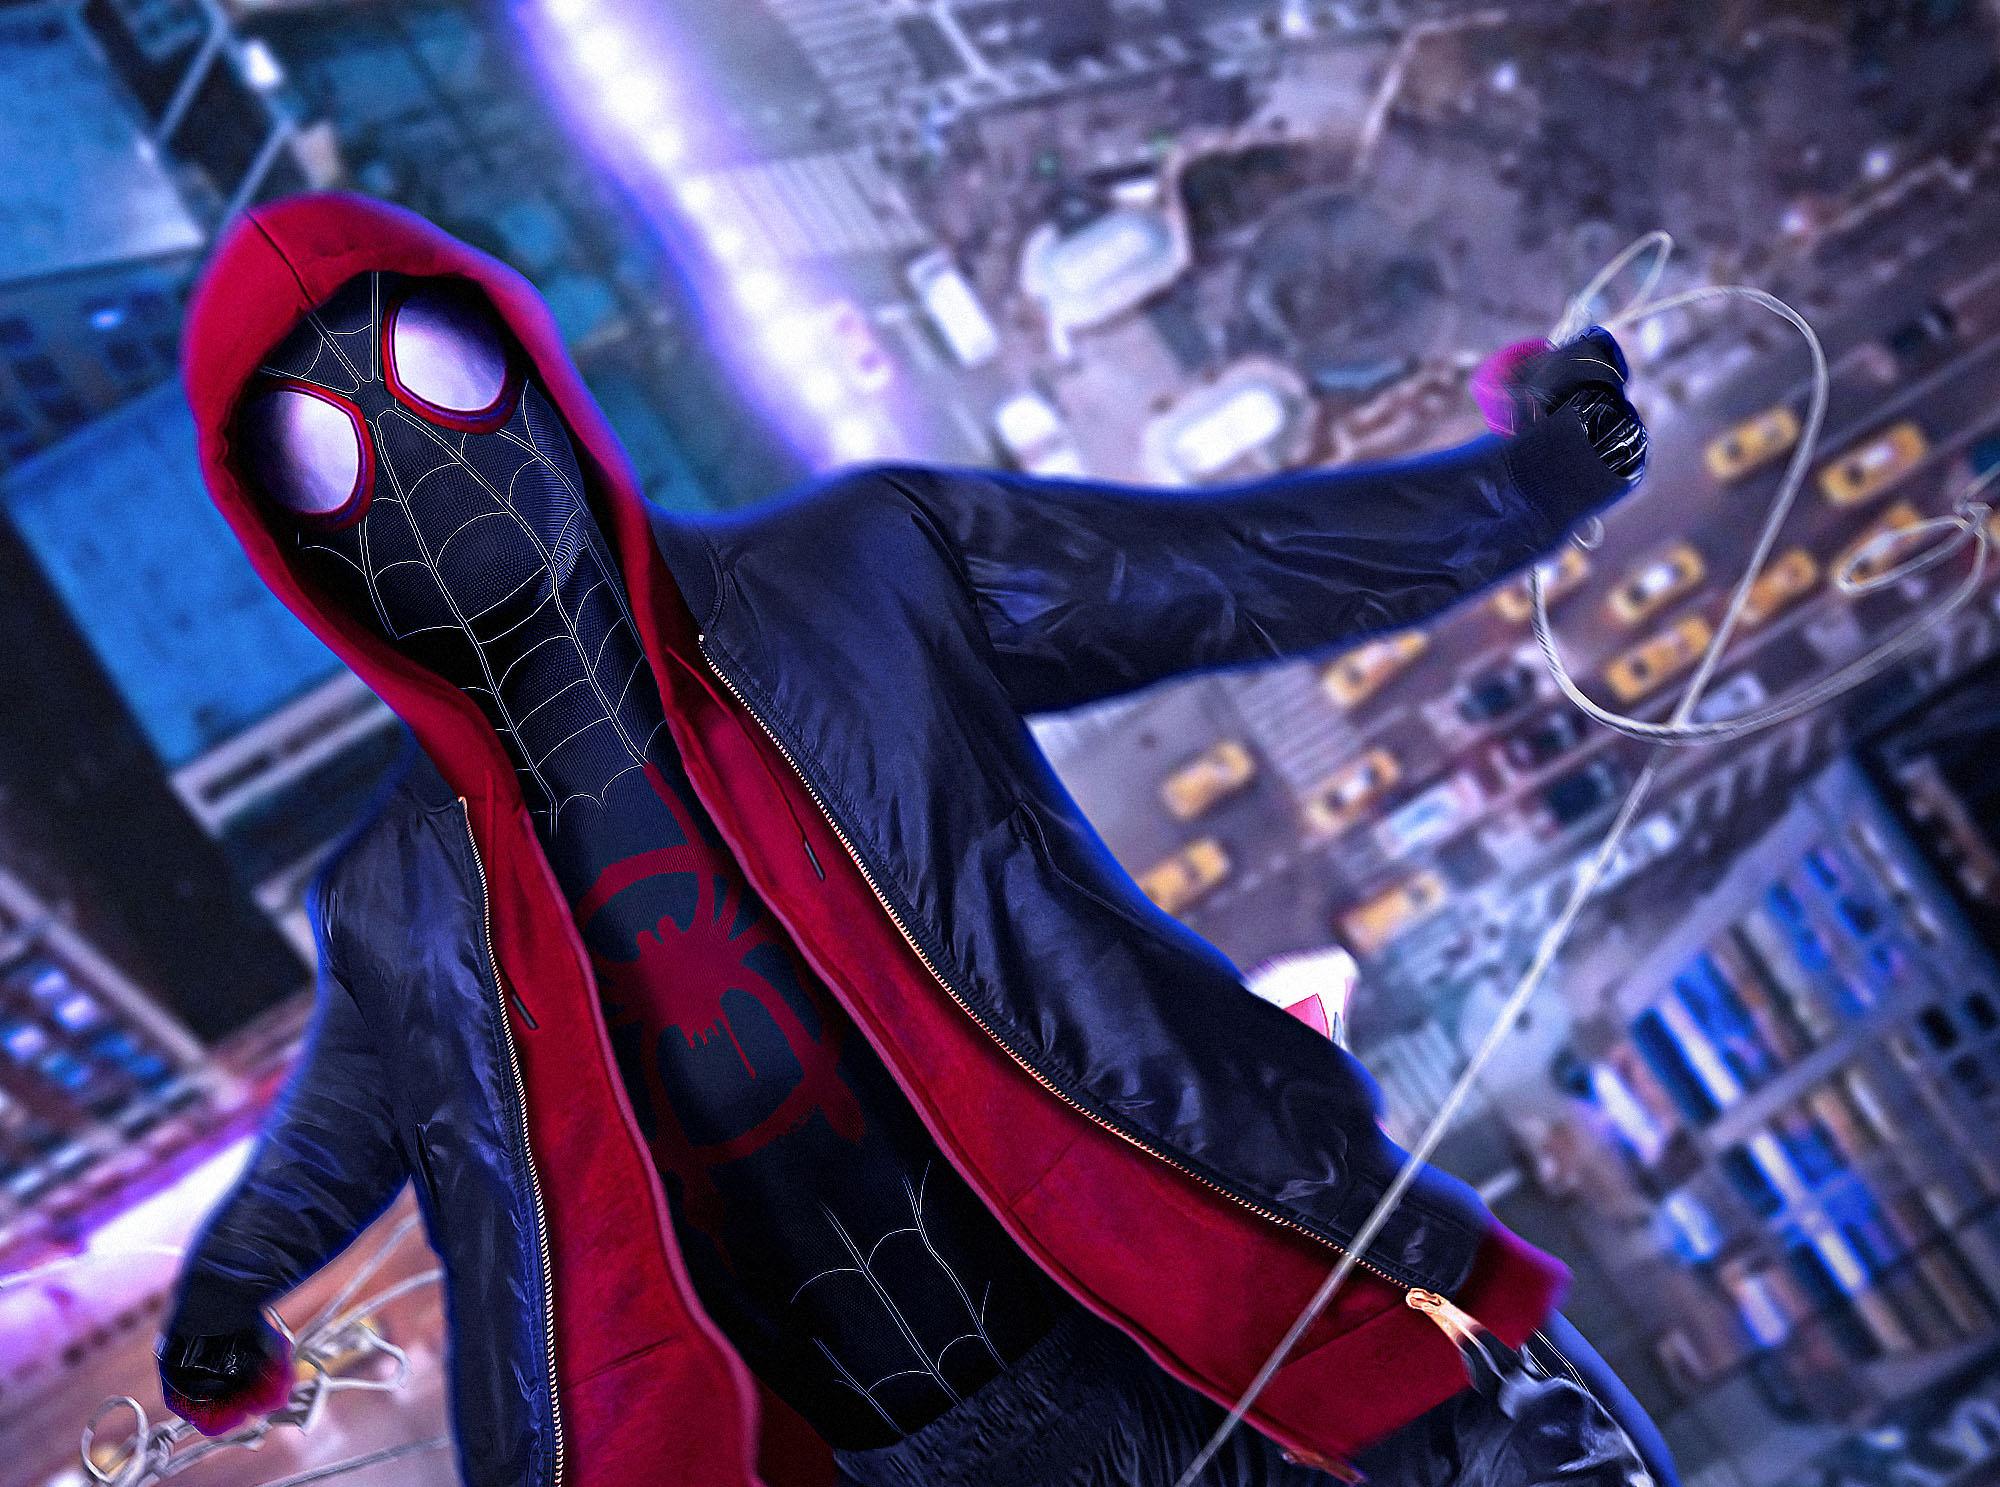 1024x768 SpiderMan Into The Spider Verse Movie Cosplay